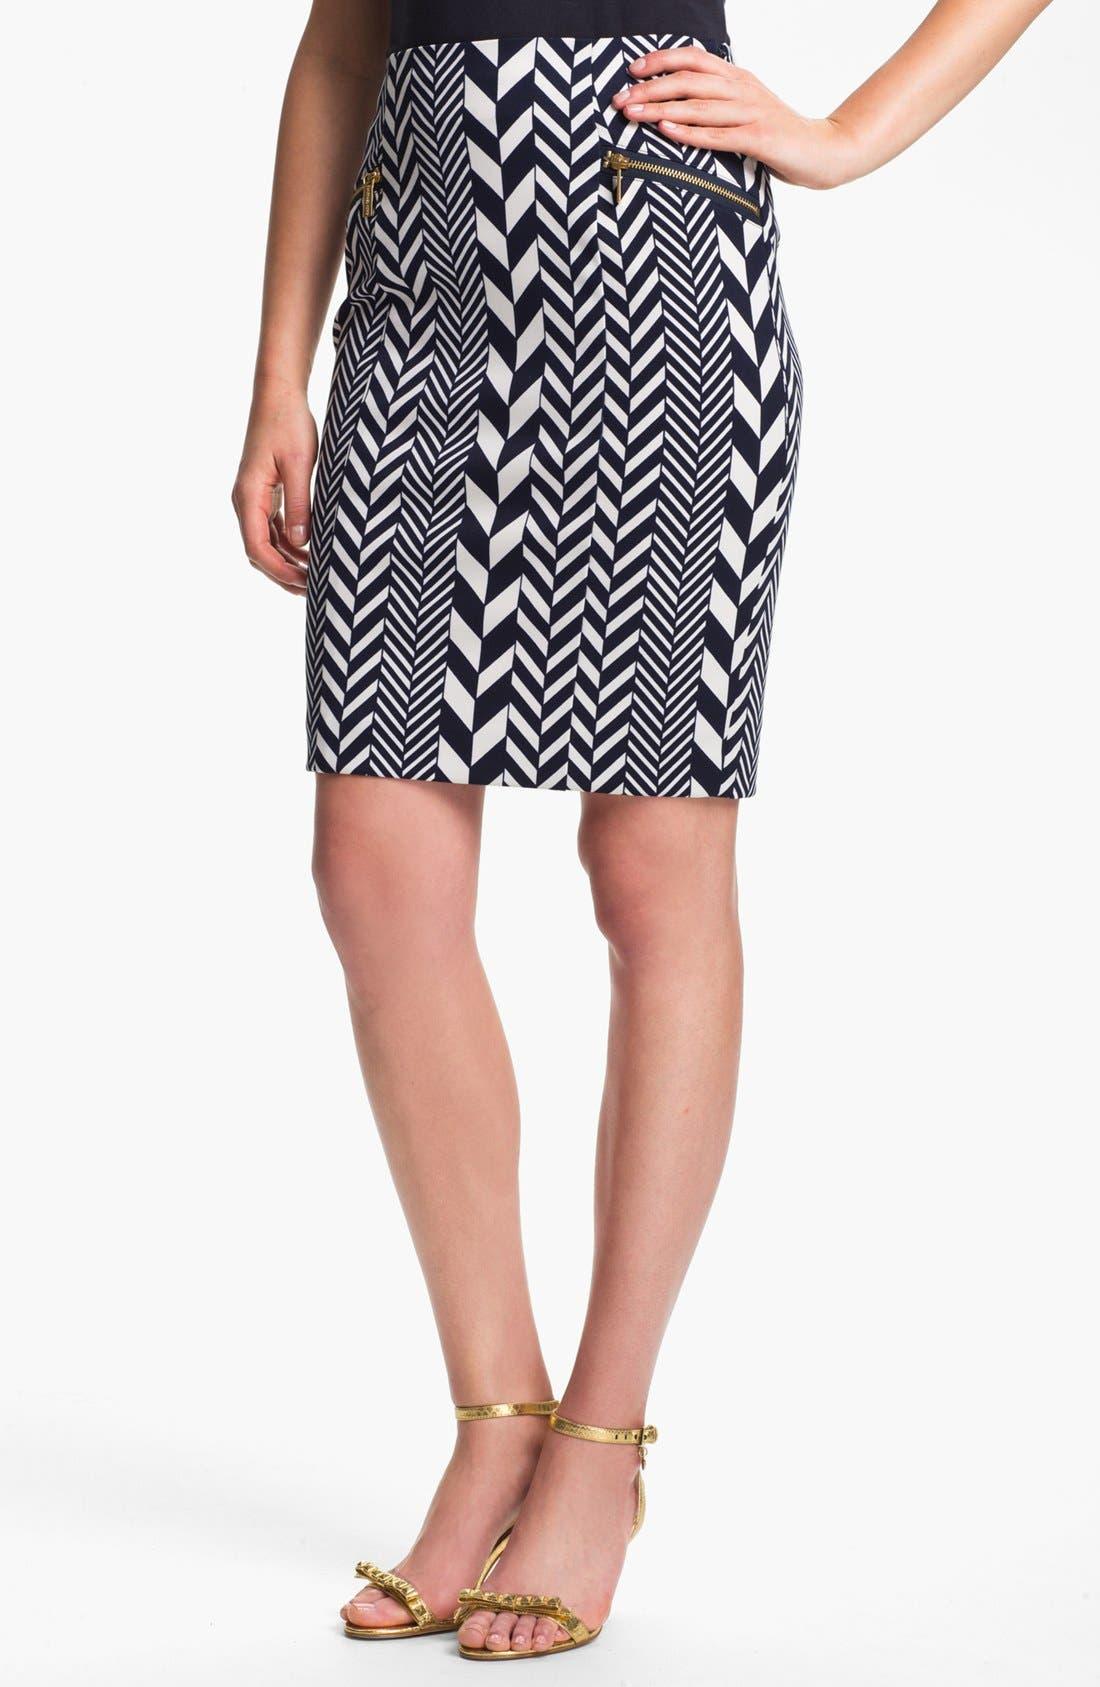 Alternate Image 1 Selected - MICHAEL Michael Kors 'League Stripe' Pencil Skirt (Regular & Petite)